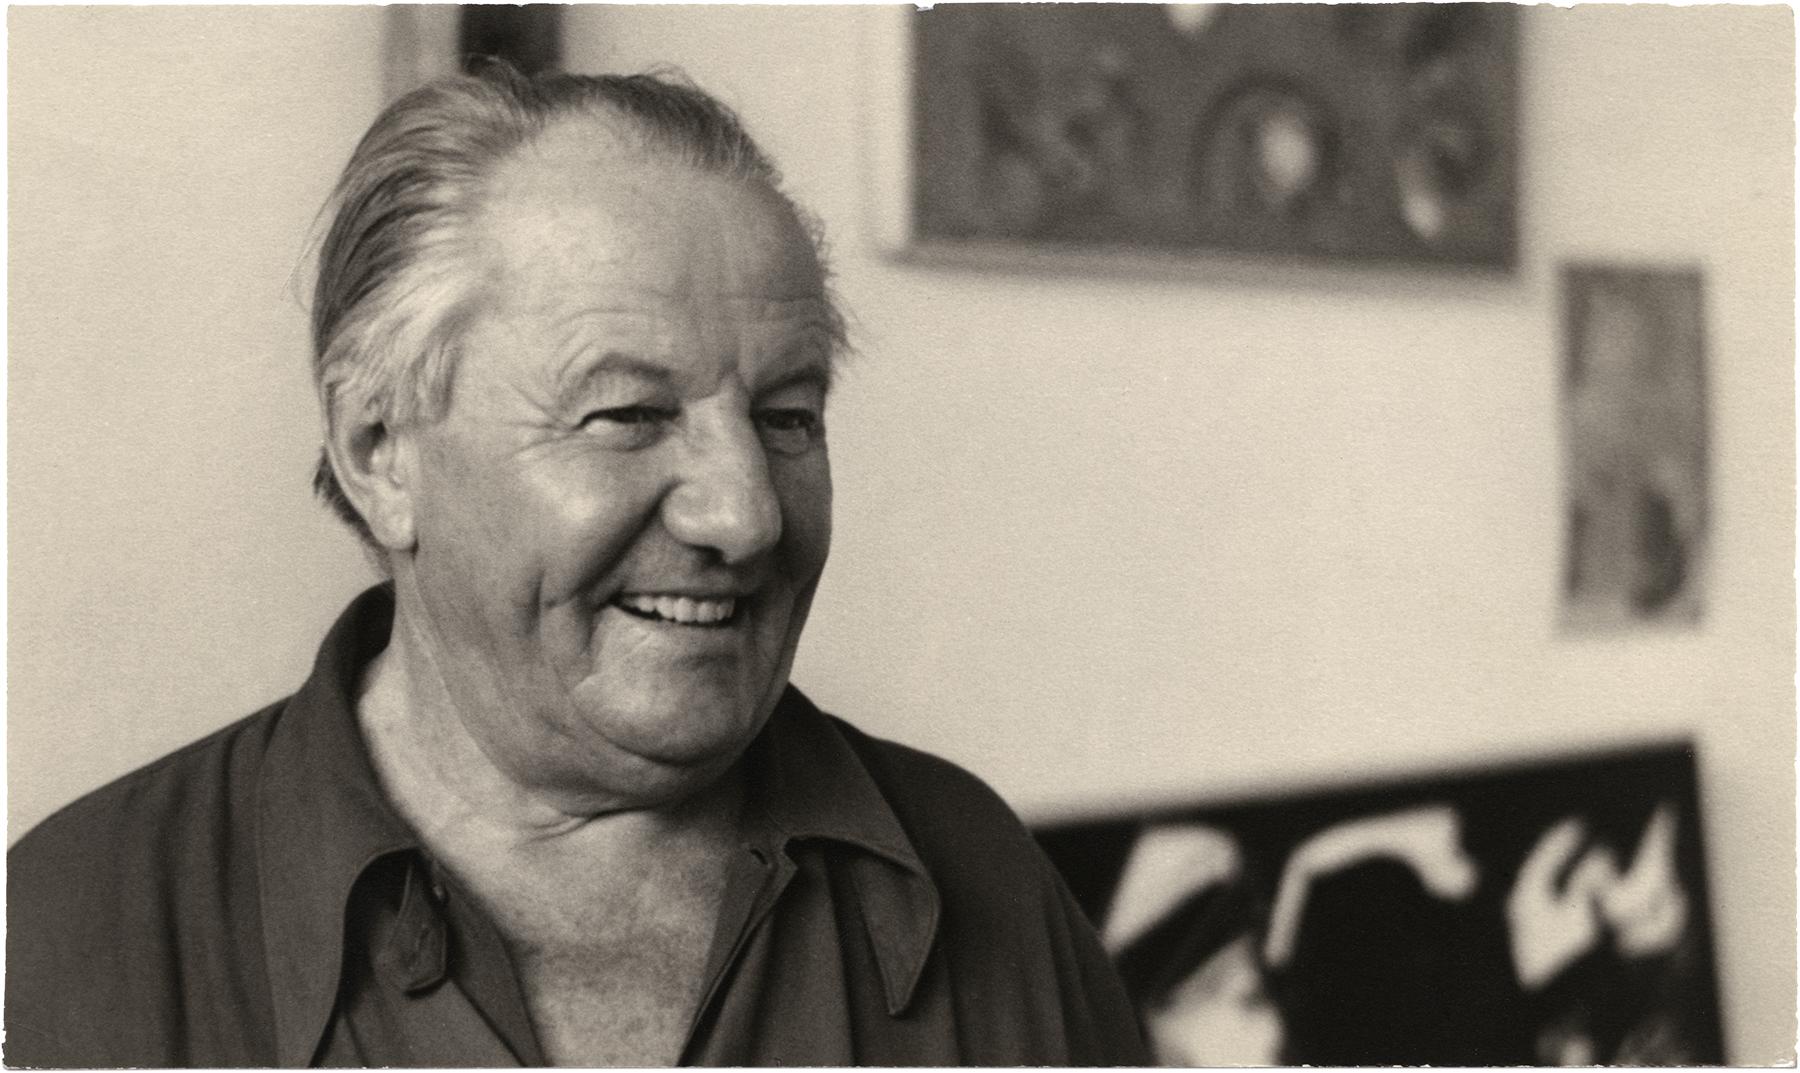 Hans Hofmann, 1949, photographed by Bill Witt in Provincetown, MA. Copyright Estate of Bill Witt.